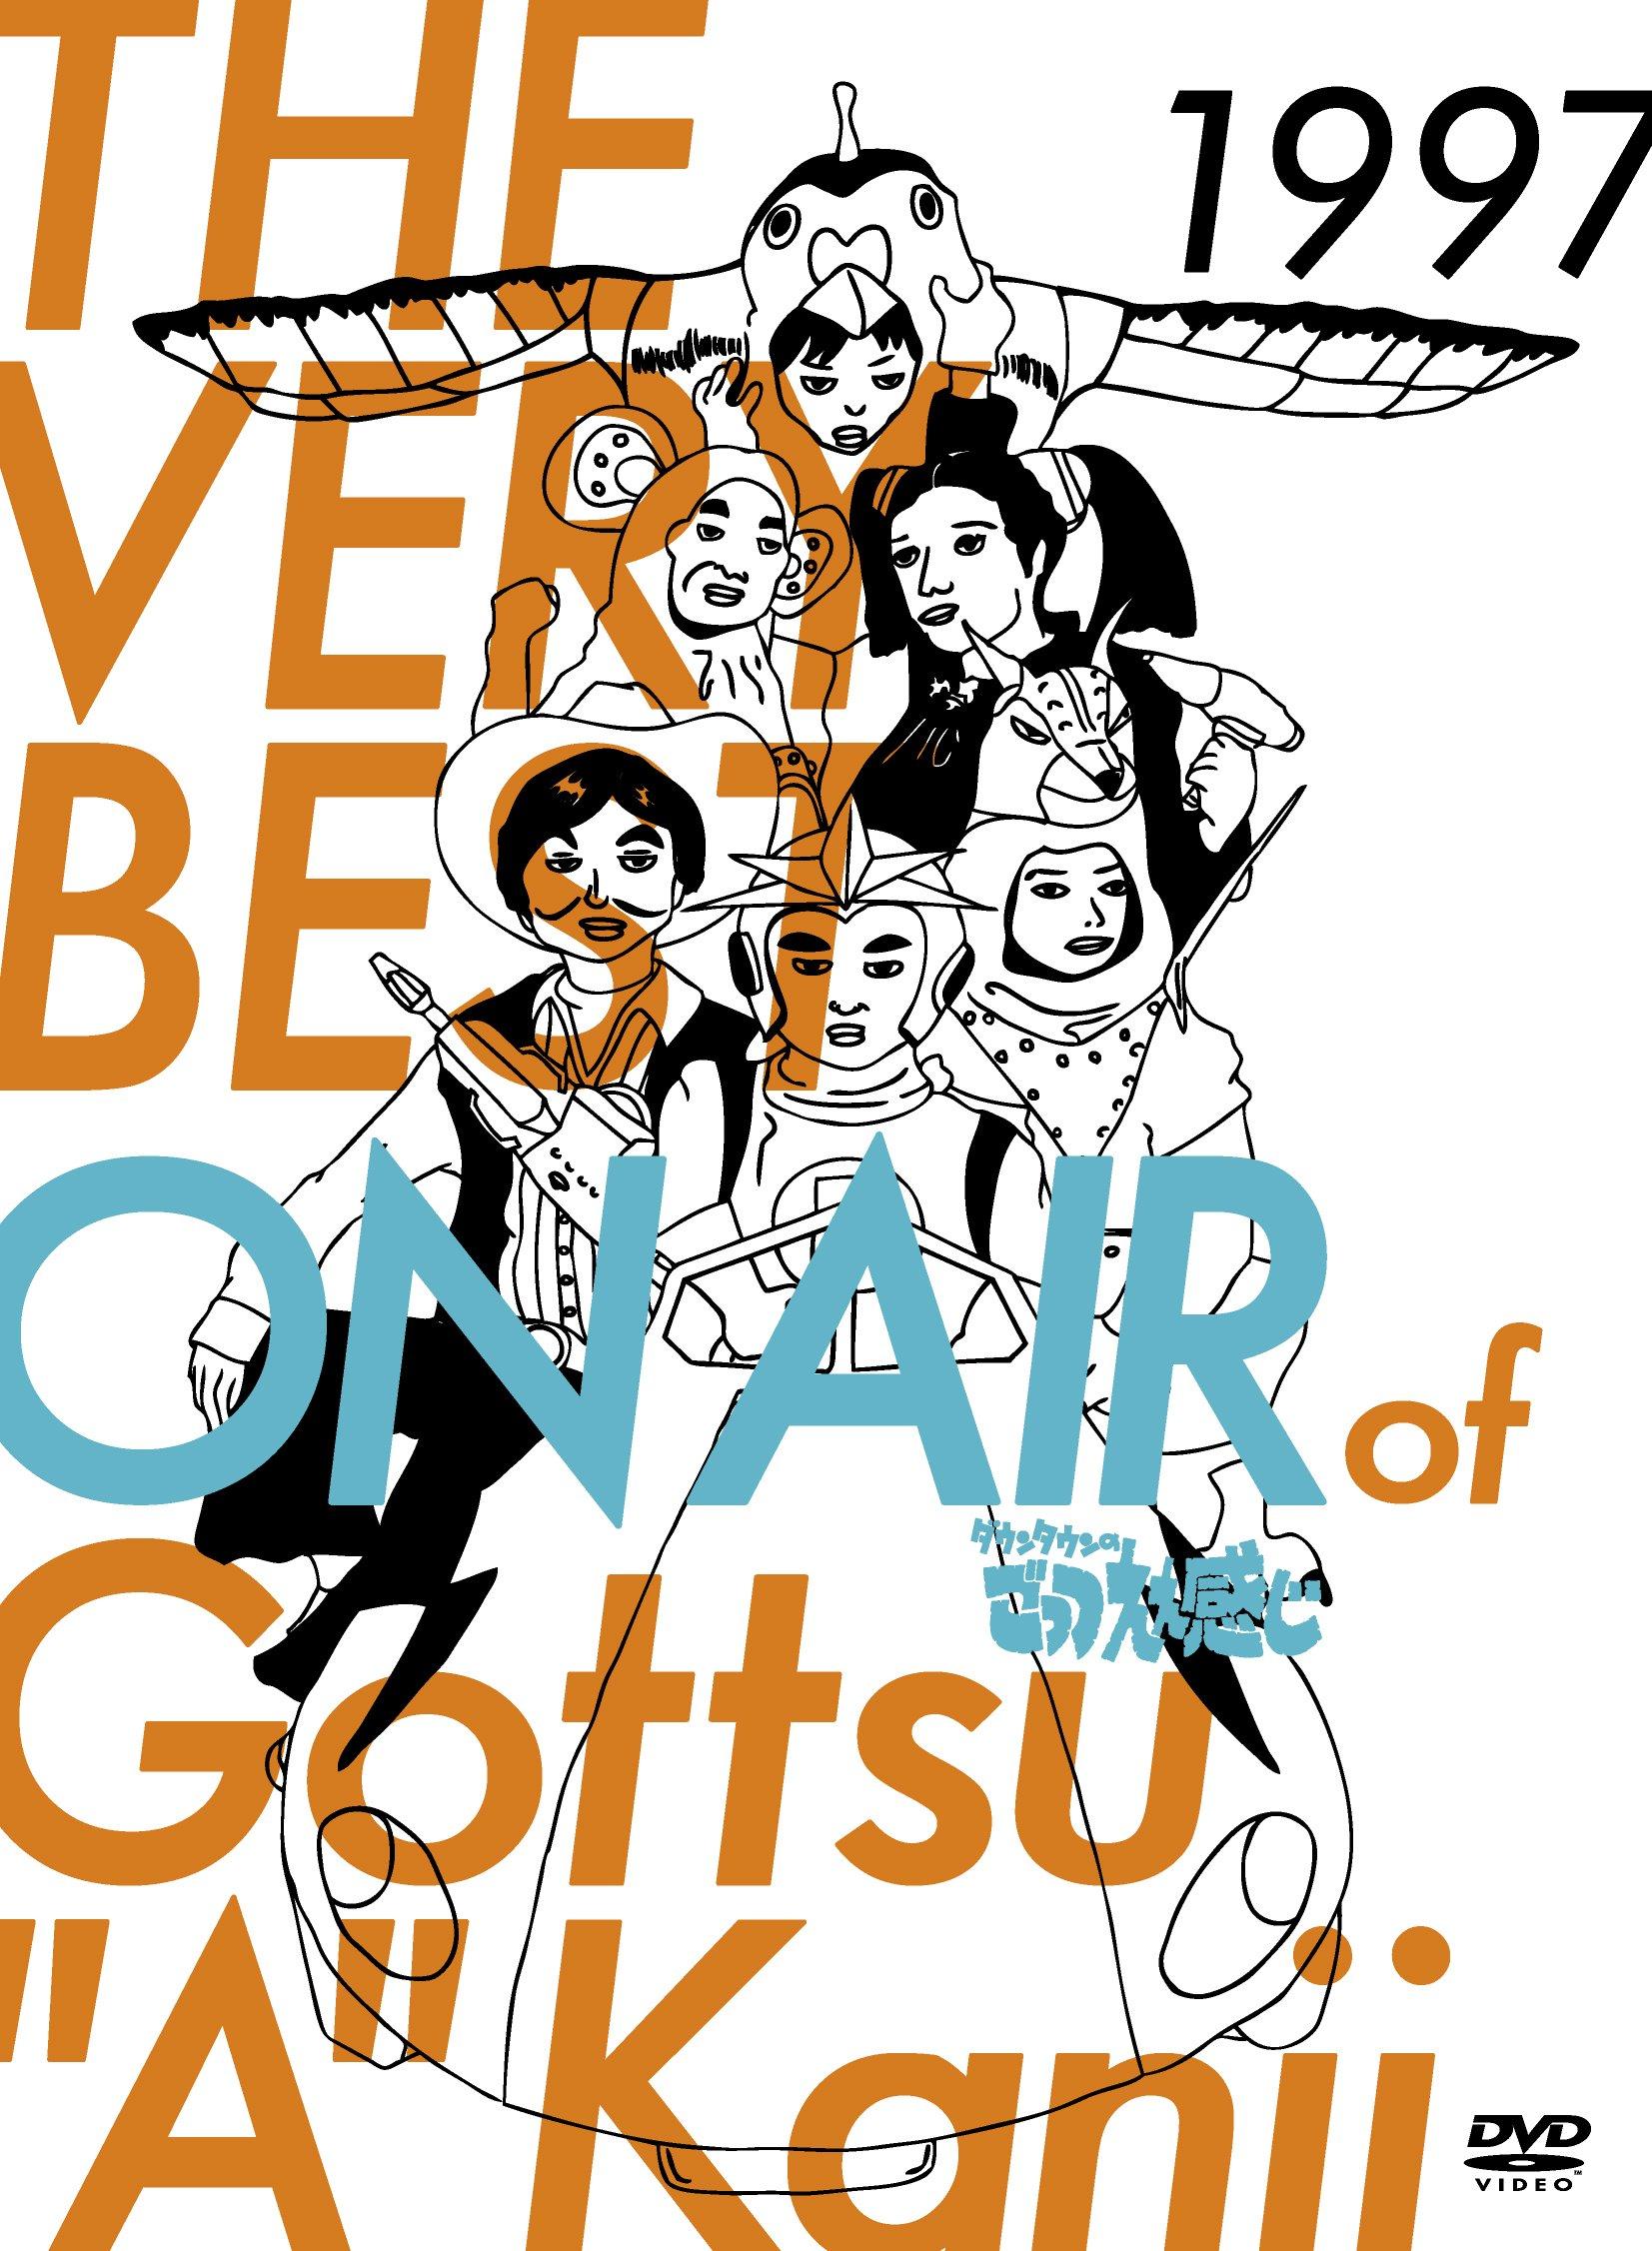 THE VERY BEST ON AIR of ダウンタウンのごっつええ感じ 1997 [DVD]